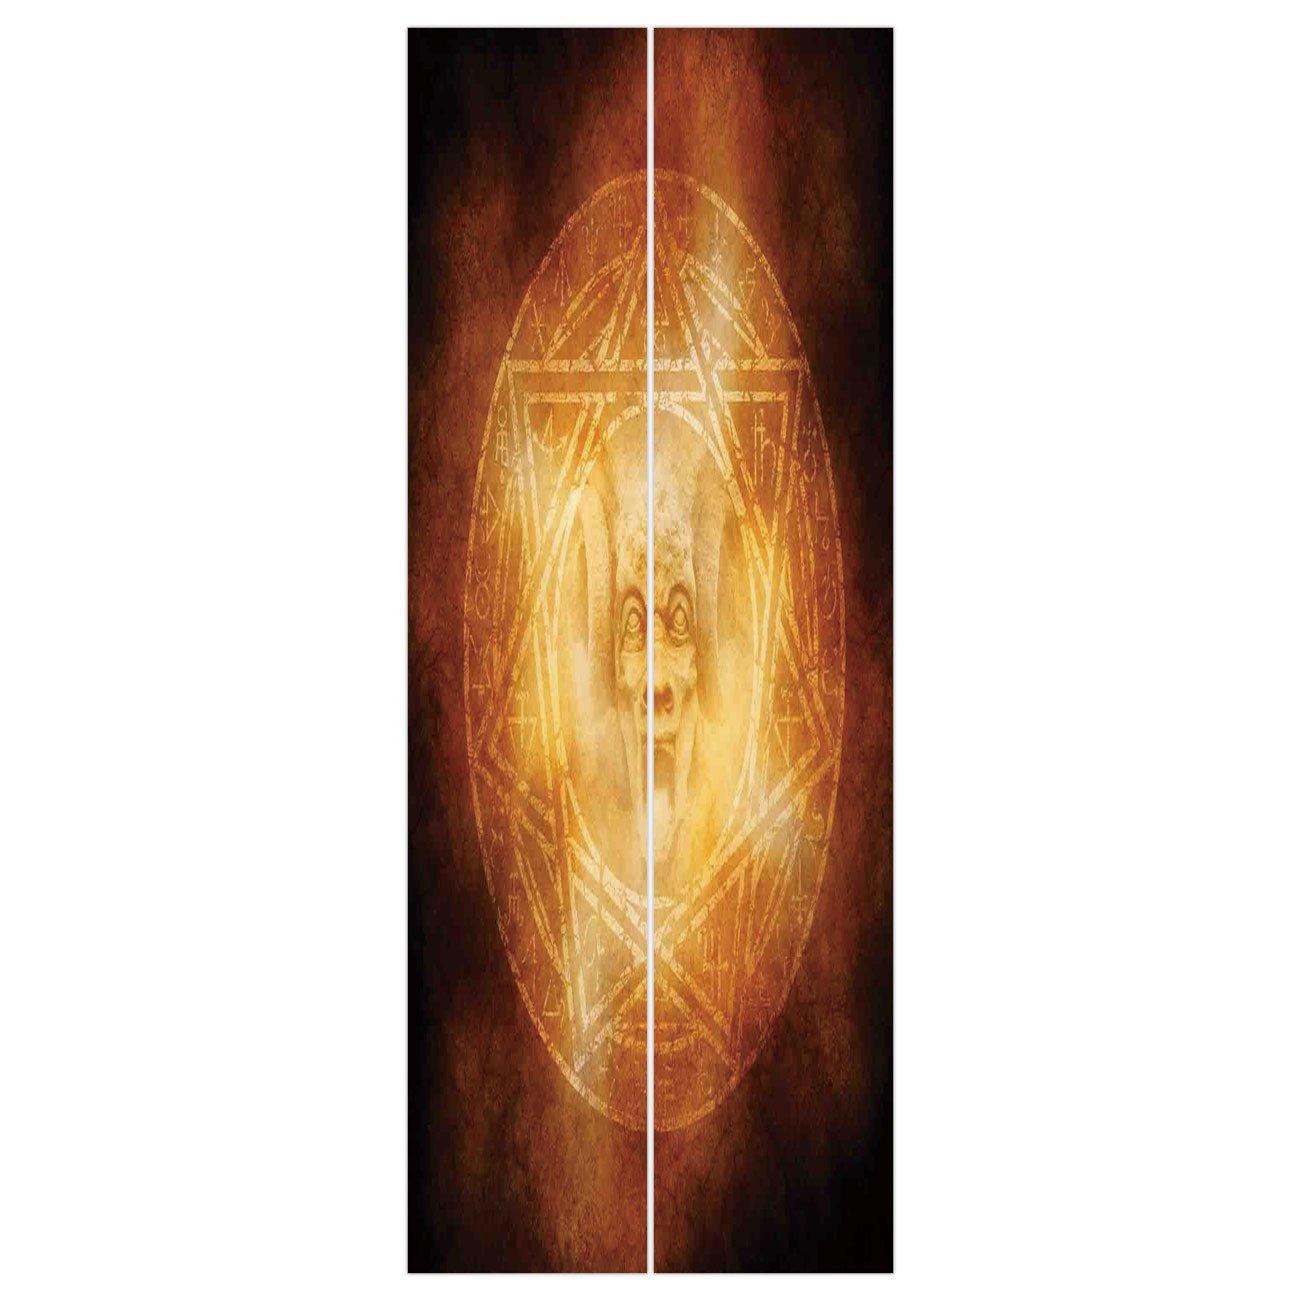 3d Door Wall Mural Wallpaper Stickers [ Horror House Decor,Demon Trap Symbol Logo Ceremony Creepy Ritual Fantasy Paranormal Design,Orange ] Mural Door Wall Stickers Wallpaper Mural DIY Home Decor